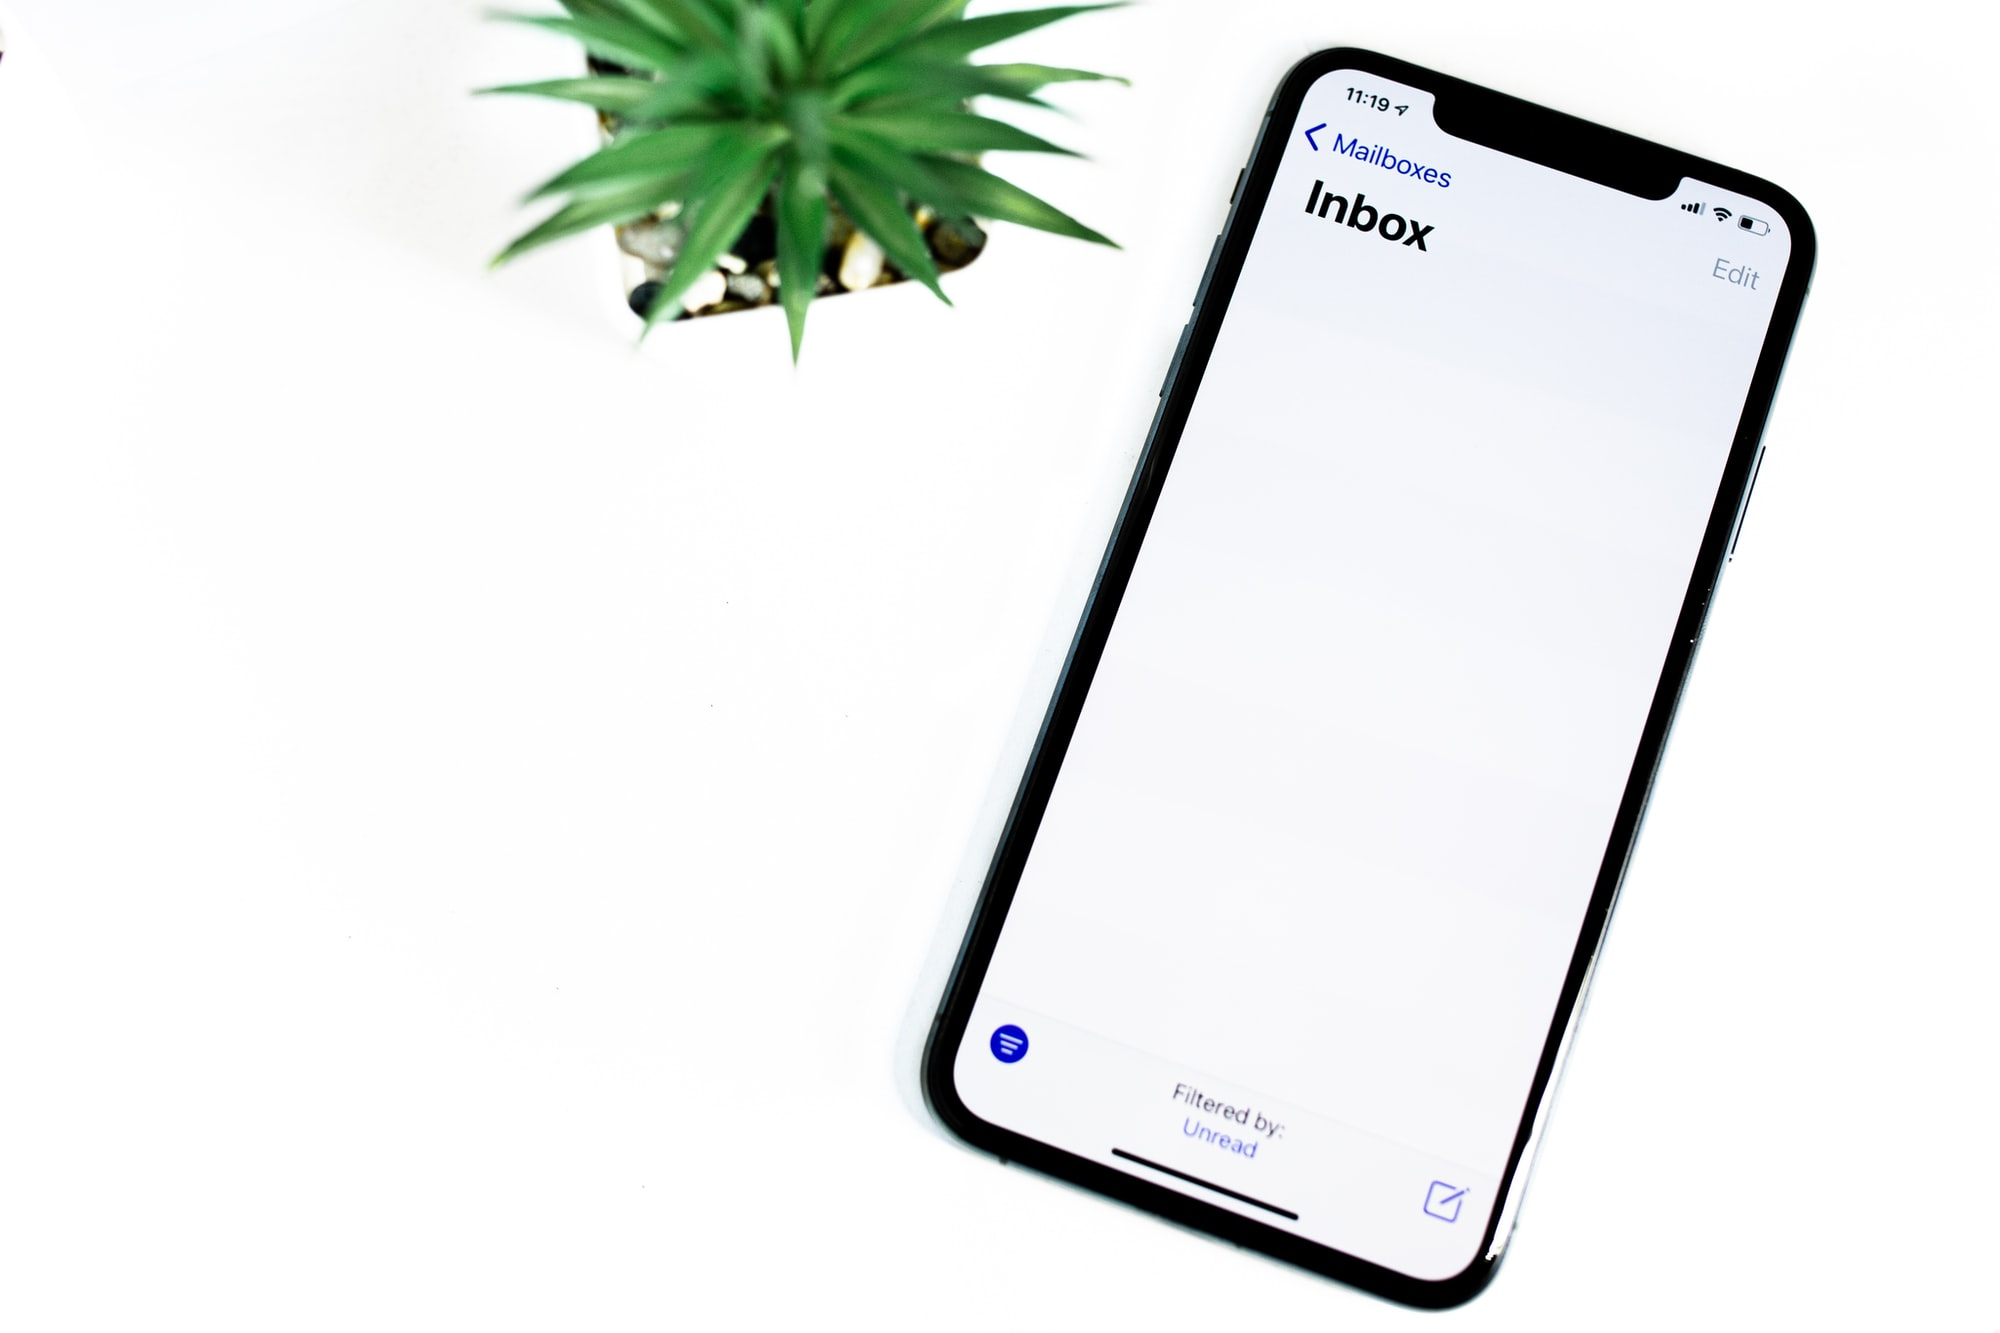 Email program on smartphone